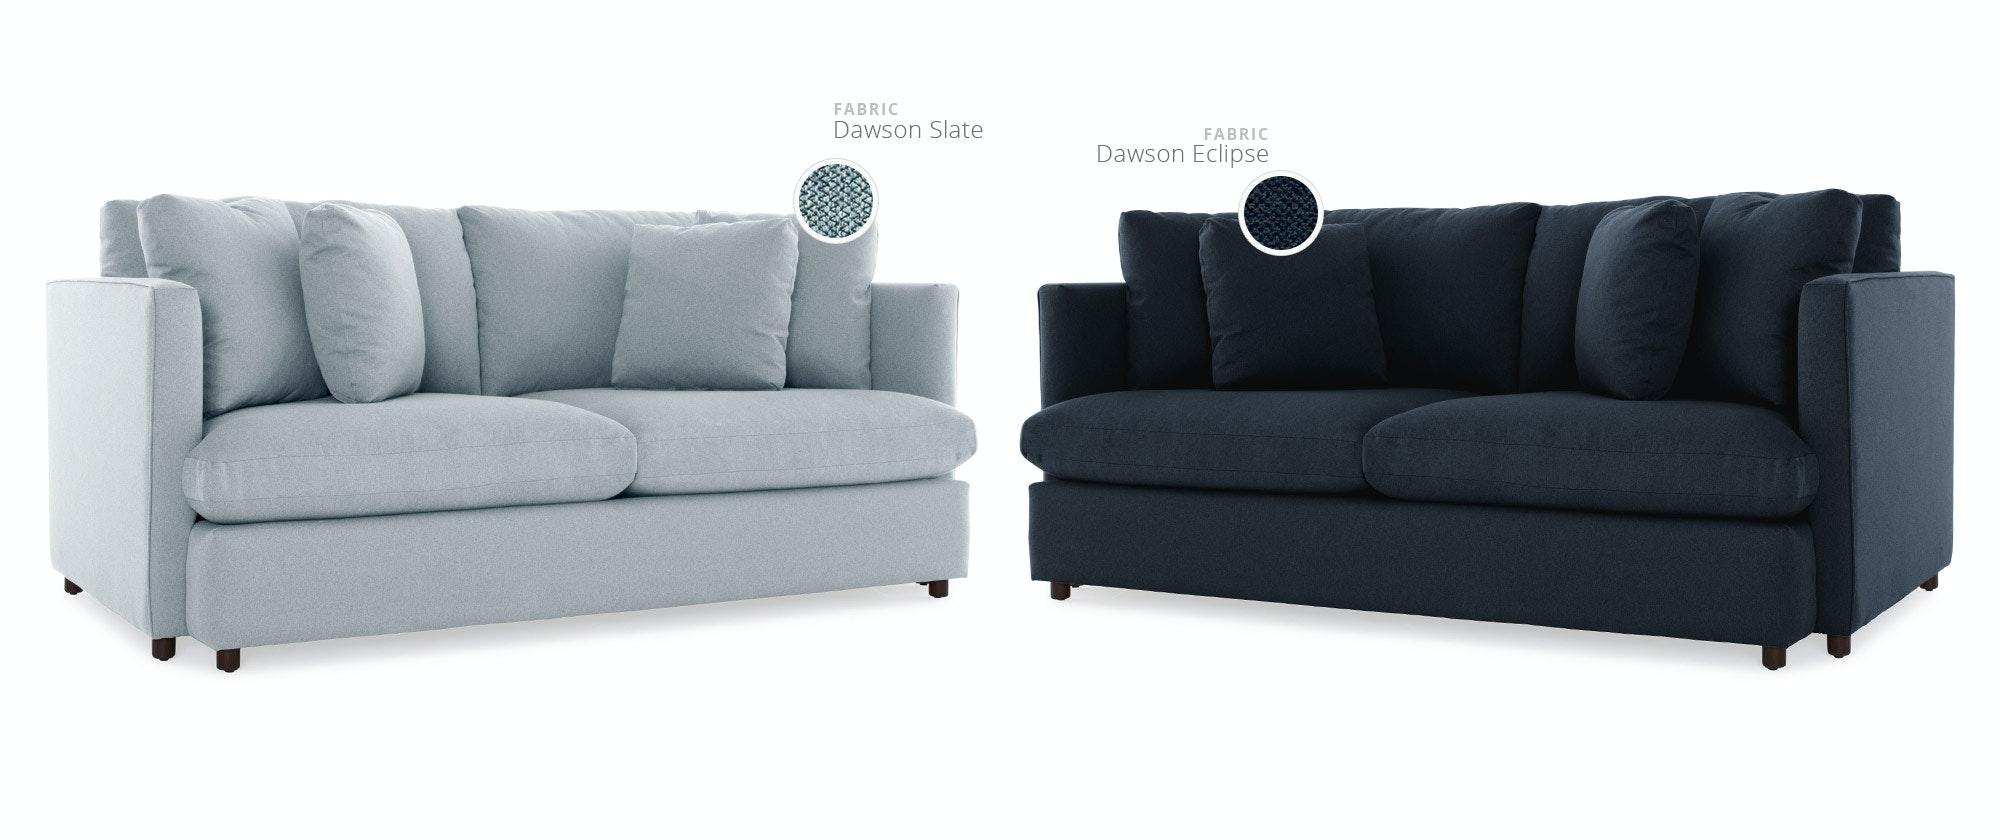 Banks Sofa Joybird : visualize banks sofa from joybird.com size 2000 x 840 jpeg 130kB